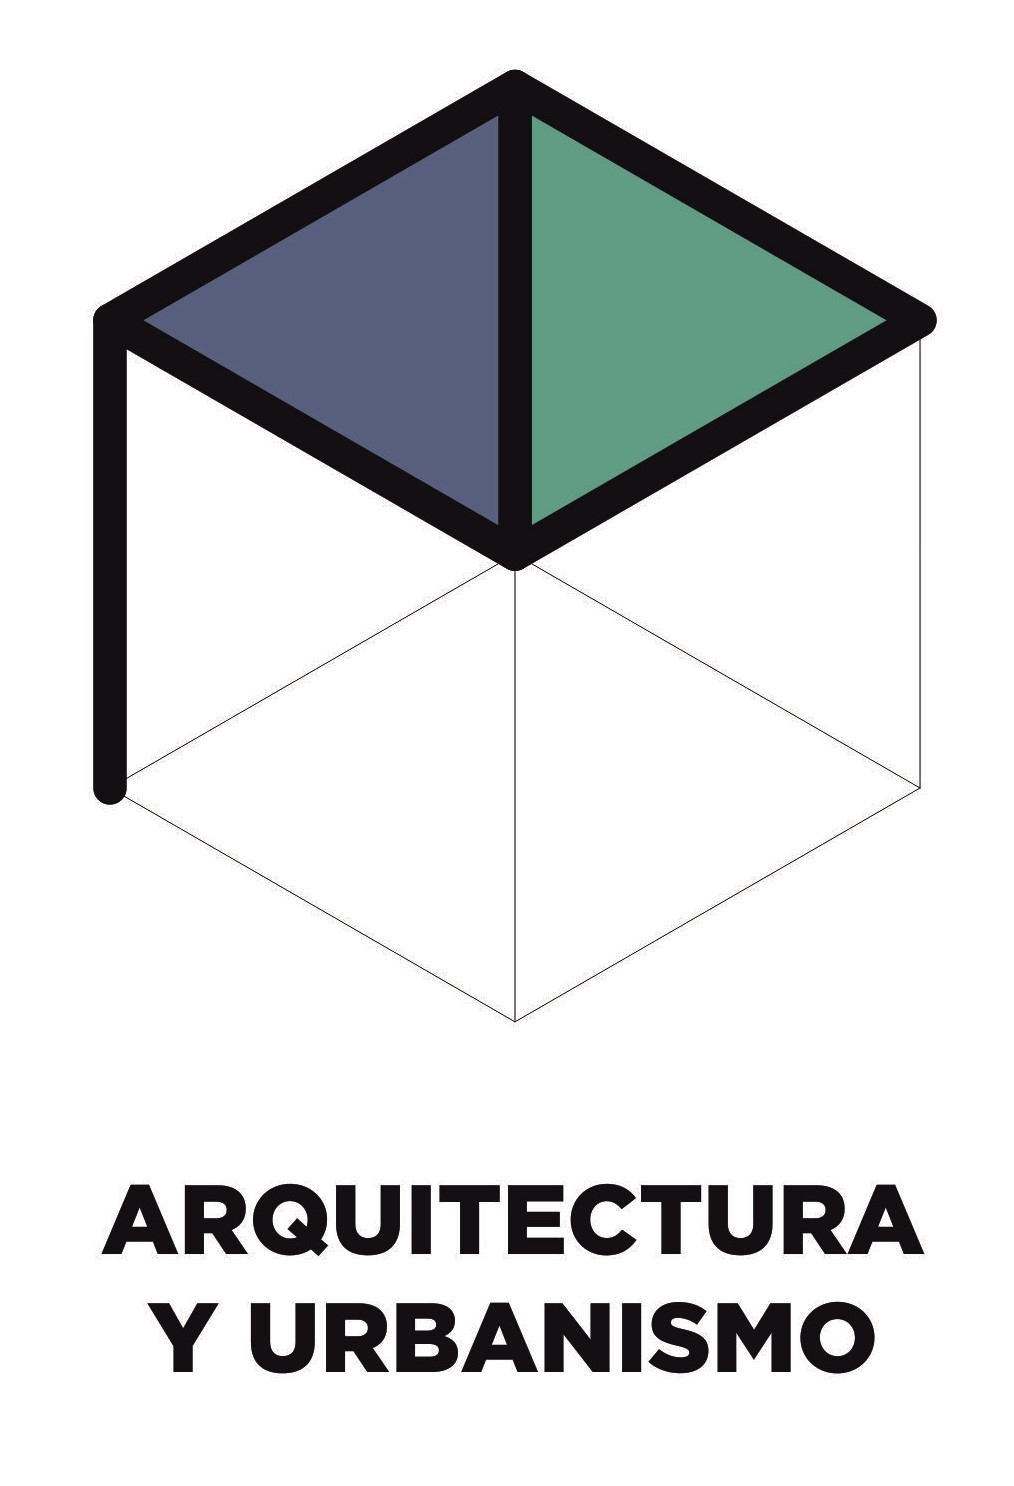 Proyectos de pdlp arquitectura y urbanismo profesional de for Arquitectura y urbanismo